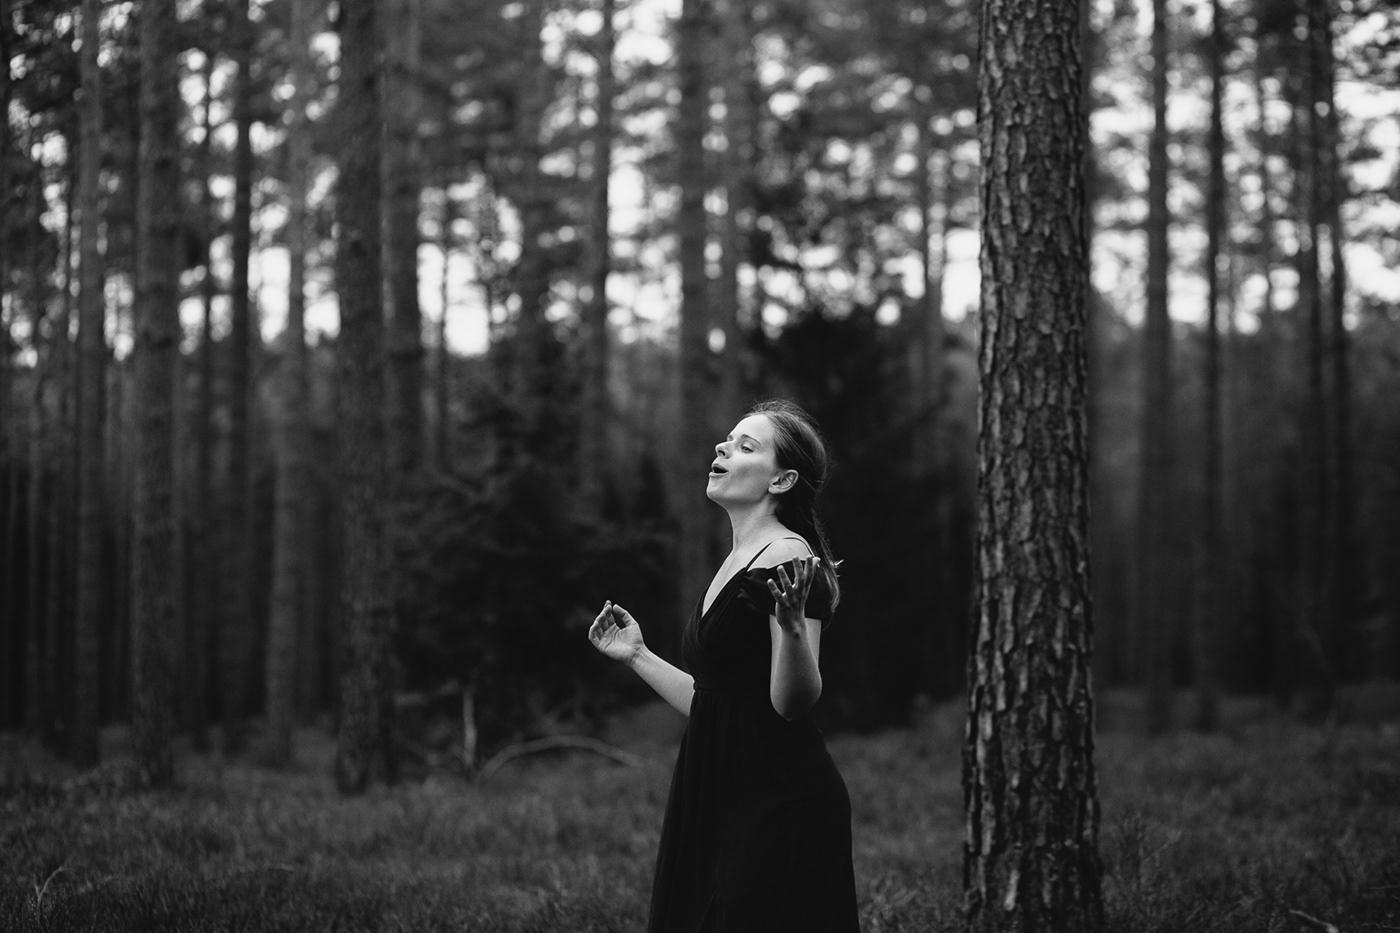 forest opera portrait Singer